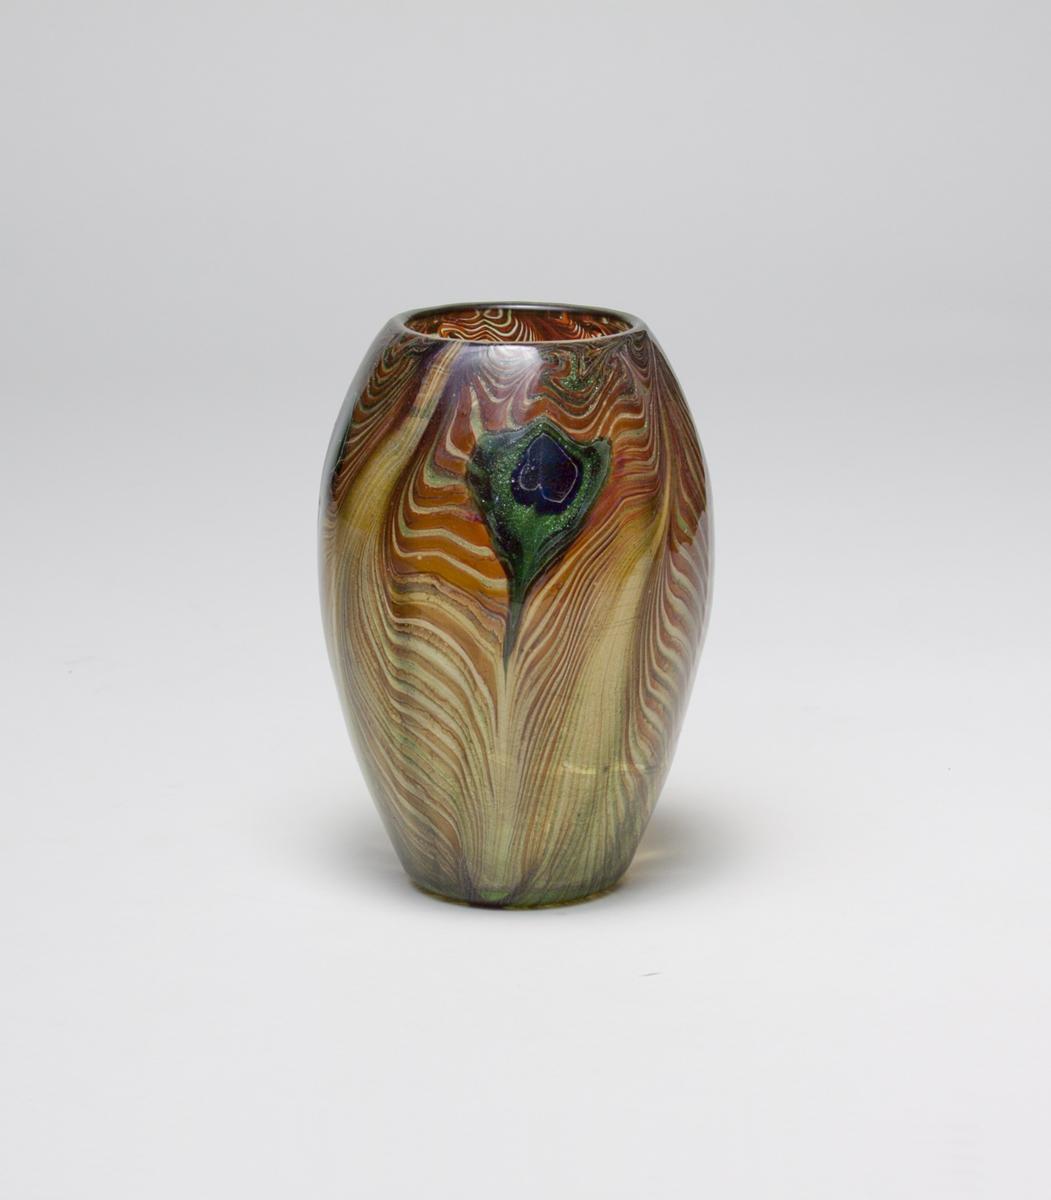 Tiffany studios favrile glass catalogue lillian nassau llc height 5 inches american circa 1896 reviewsmspy